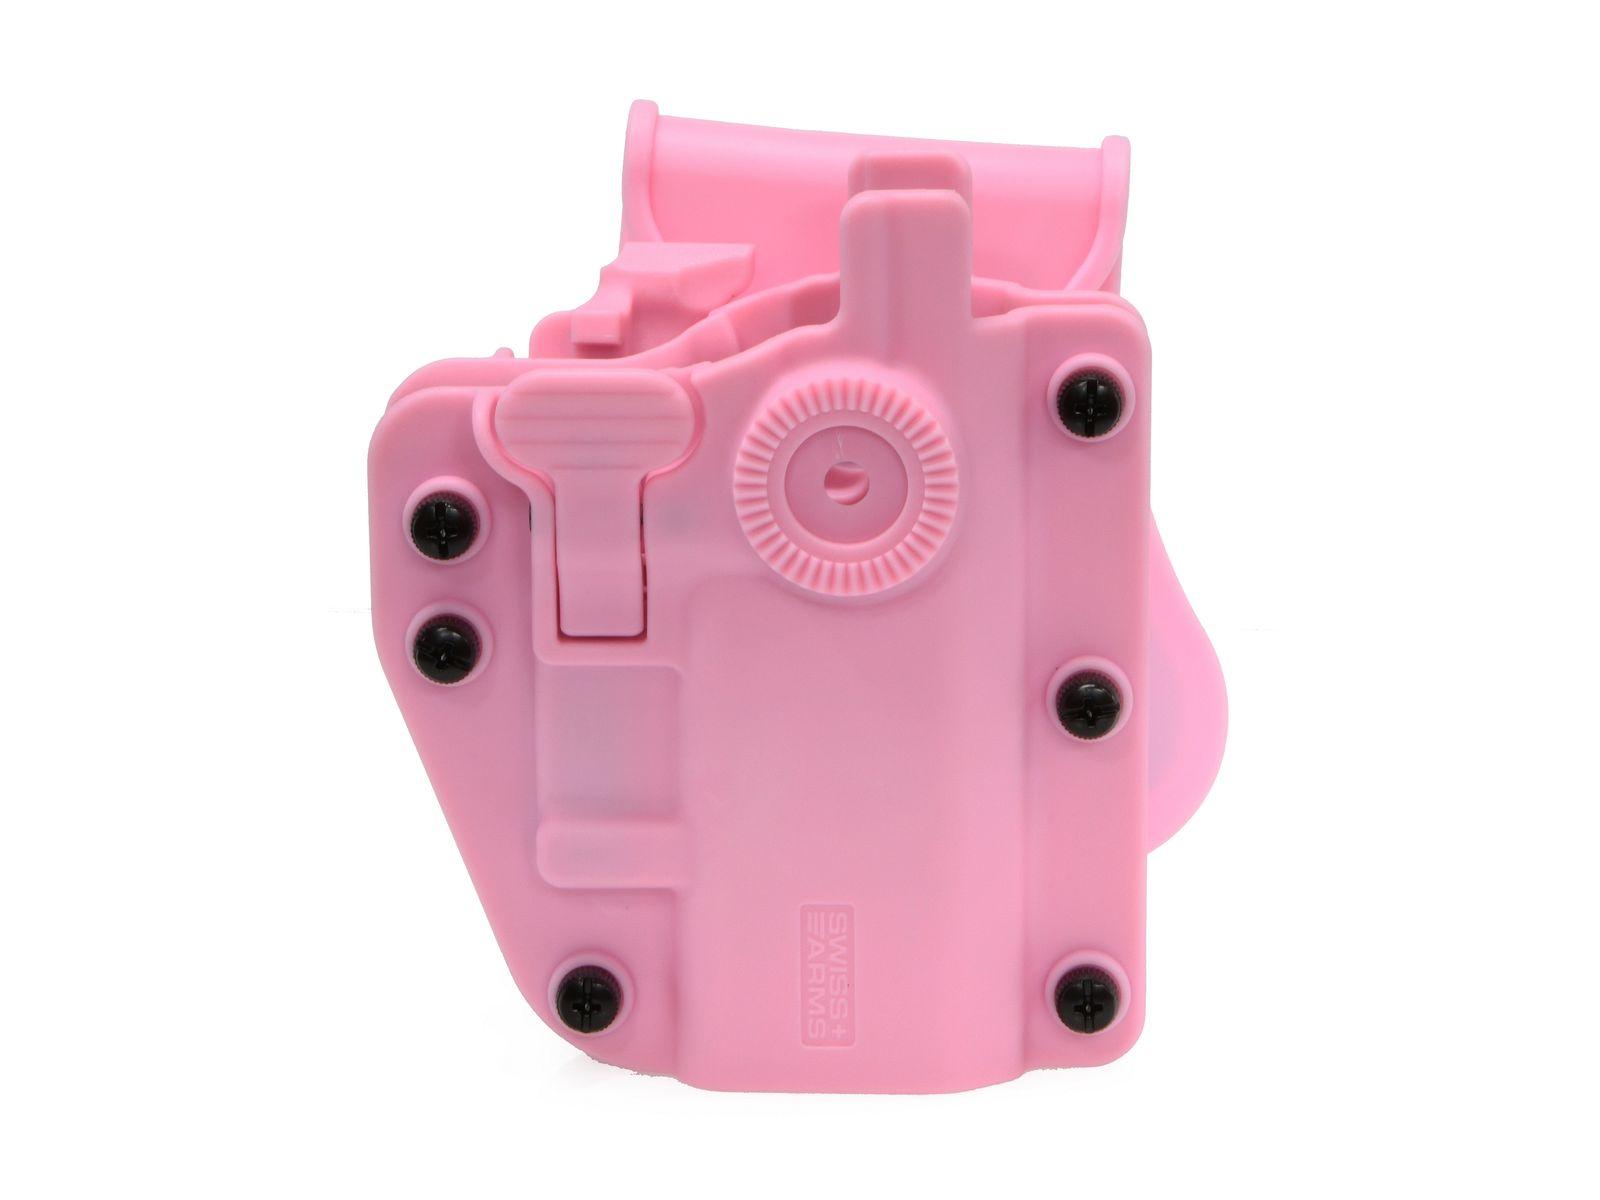 CyberGun SwissArms Universalホルスター ADAPT-X Level3 (Pink)